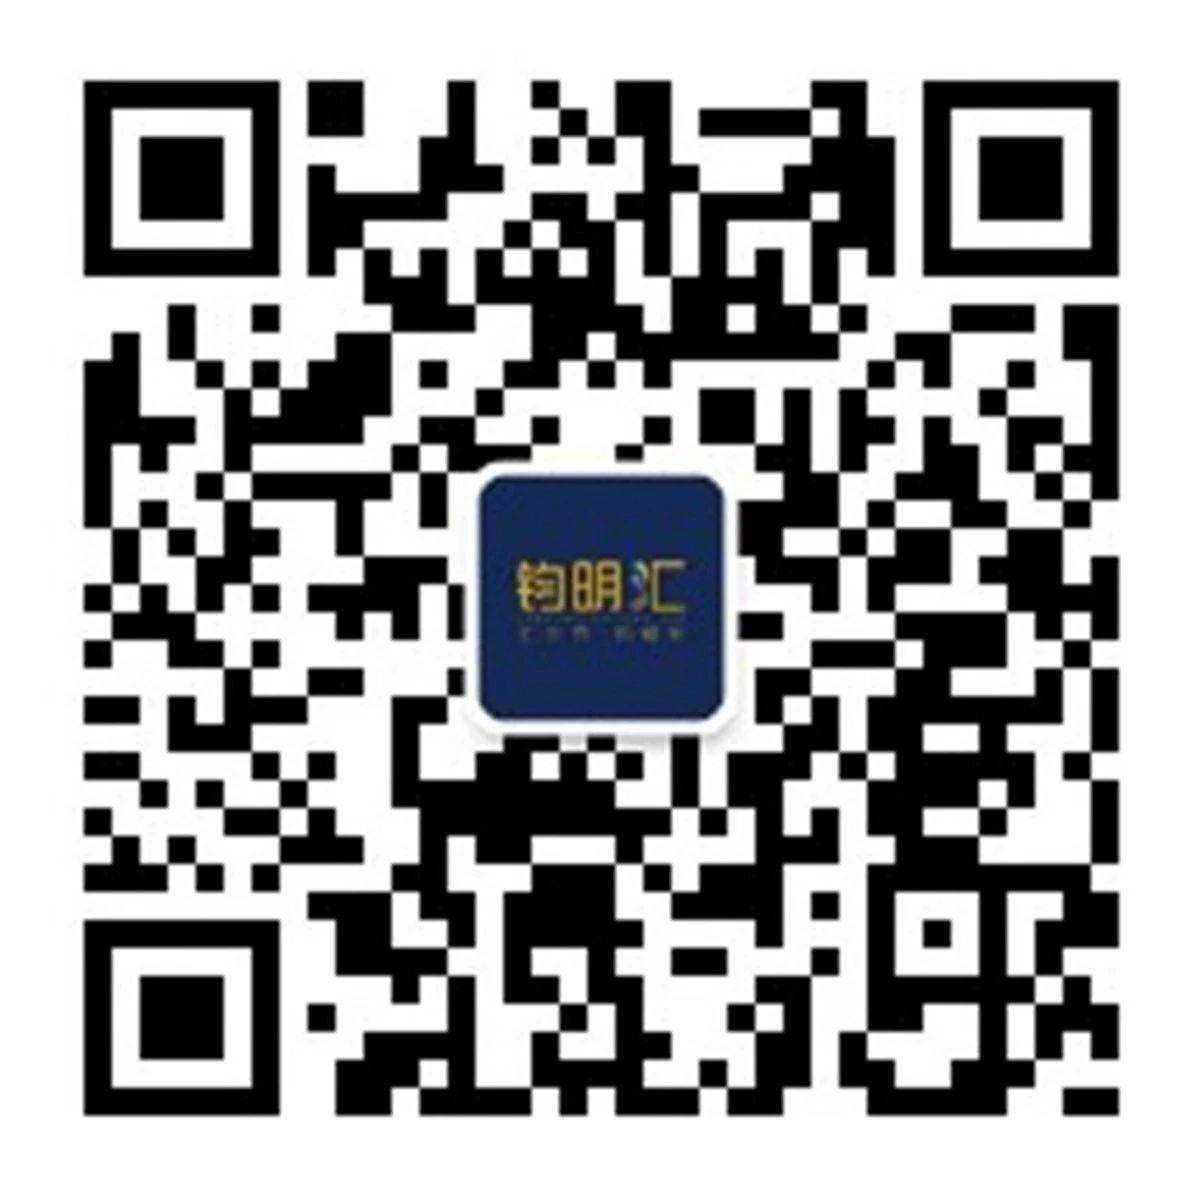 5cd4b8ae45c6382a38531cda3683322c.jpg